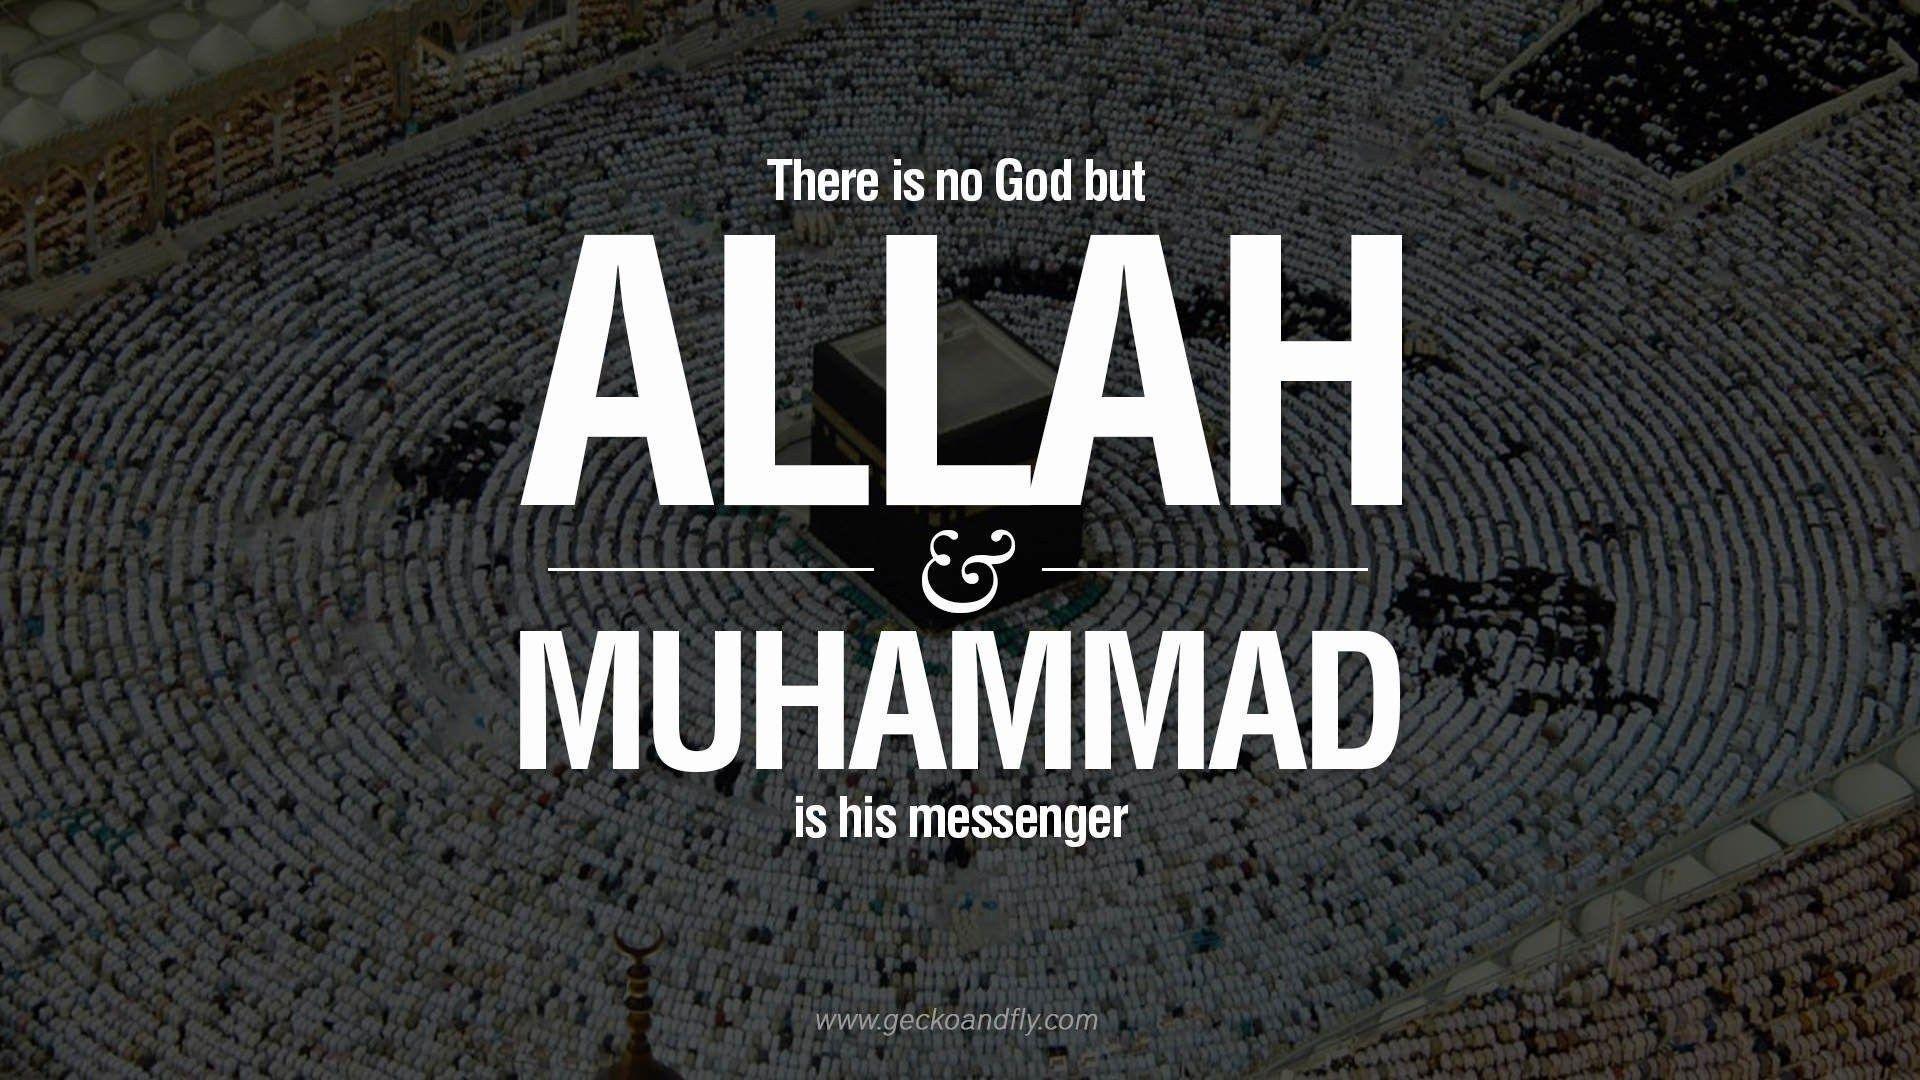 Download 100 Wallpaper Allah Muhammad Hd Android Gratis